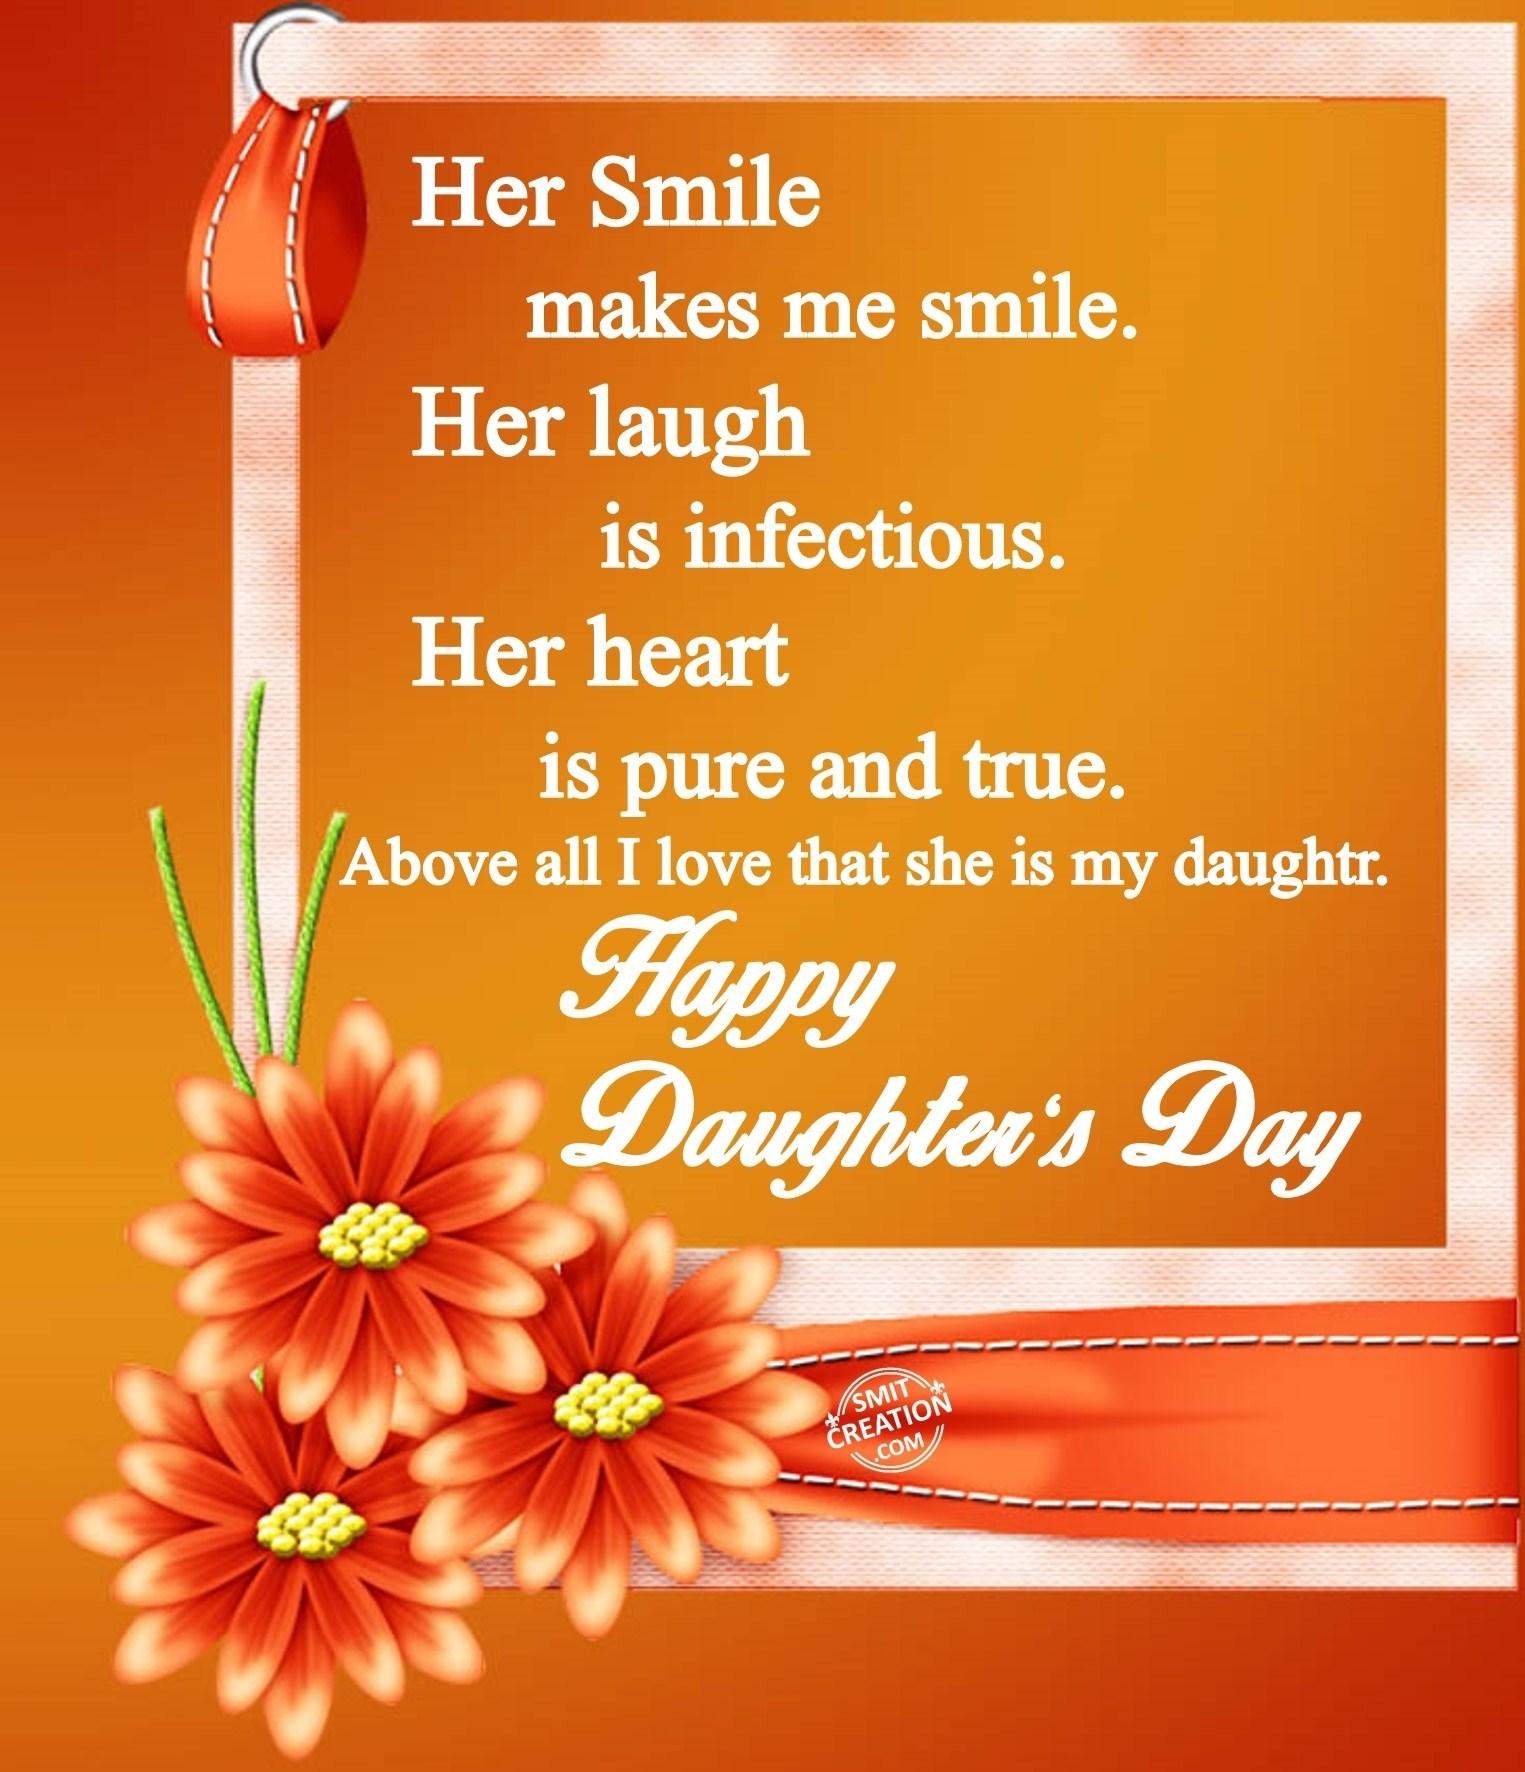 Happy Daughter's Day - SmitCreation.com